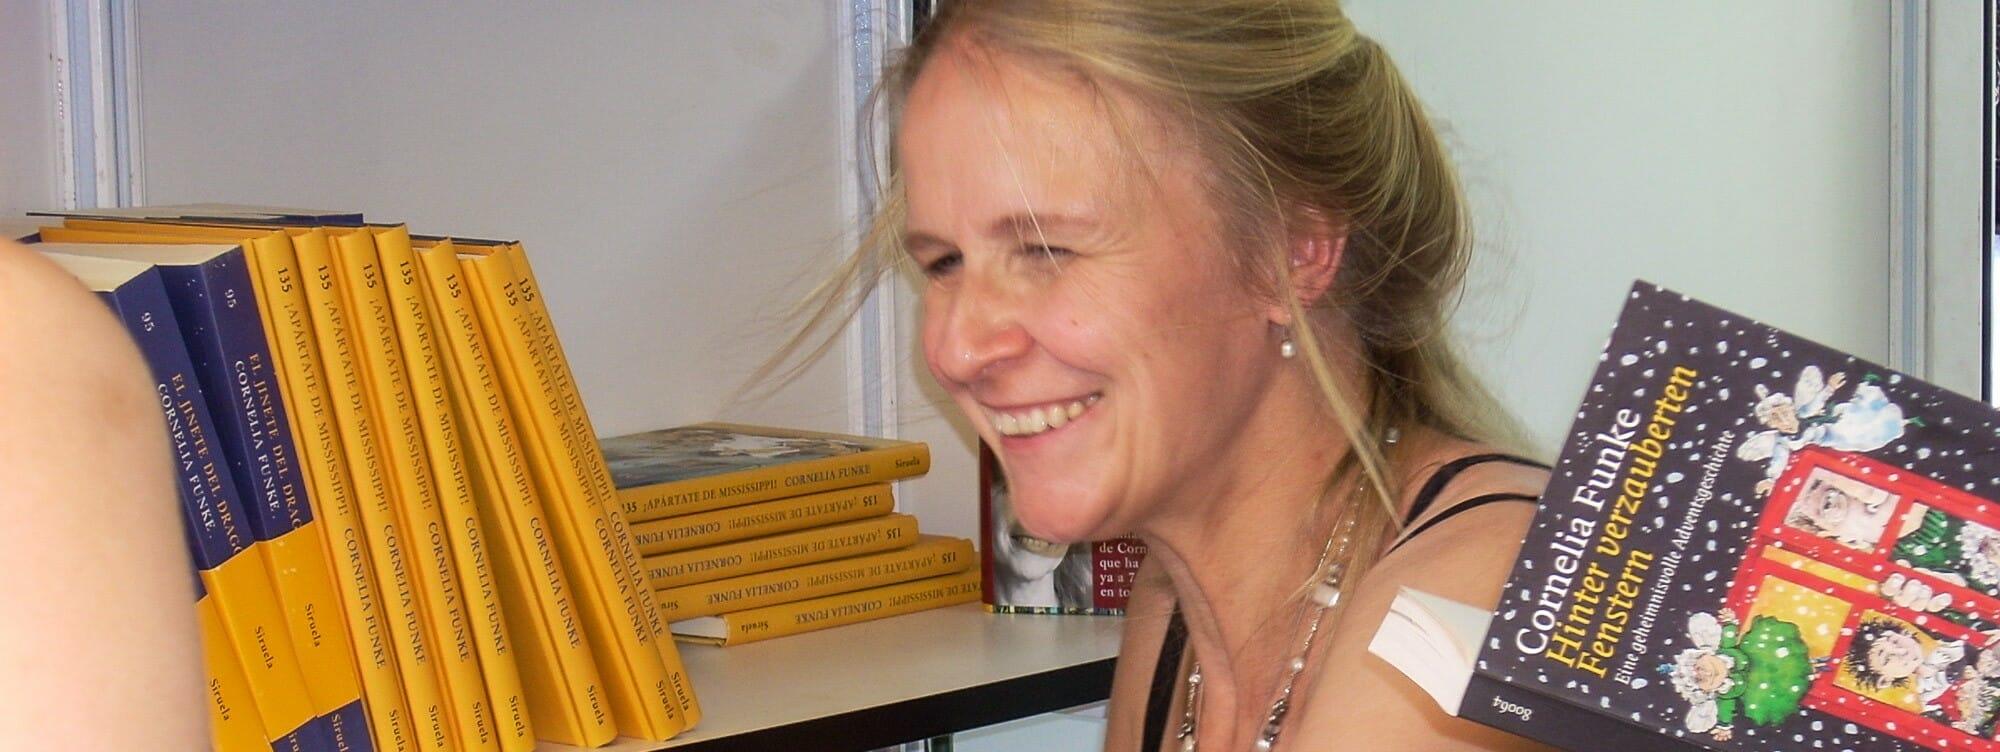 Bestseller-Autorin Cornelia Funke gründet eigenen Verlag